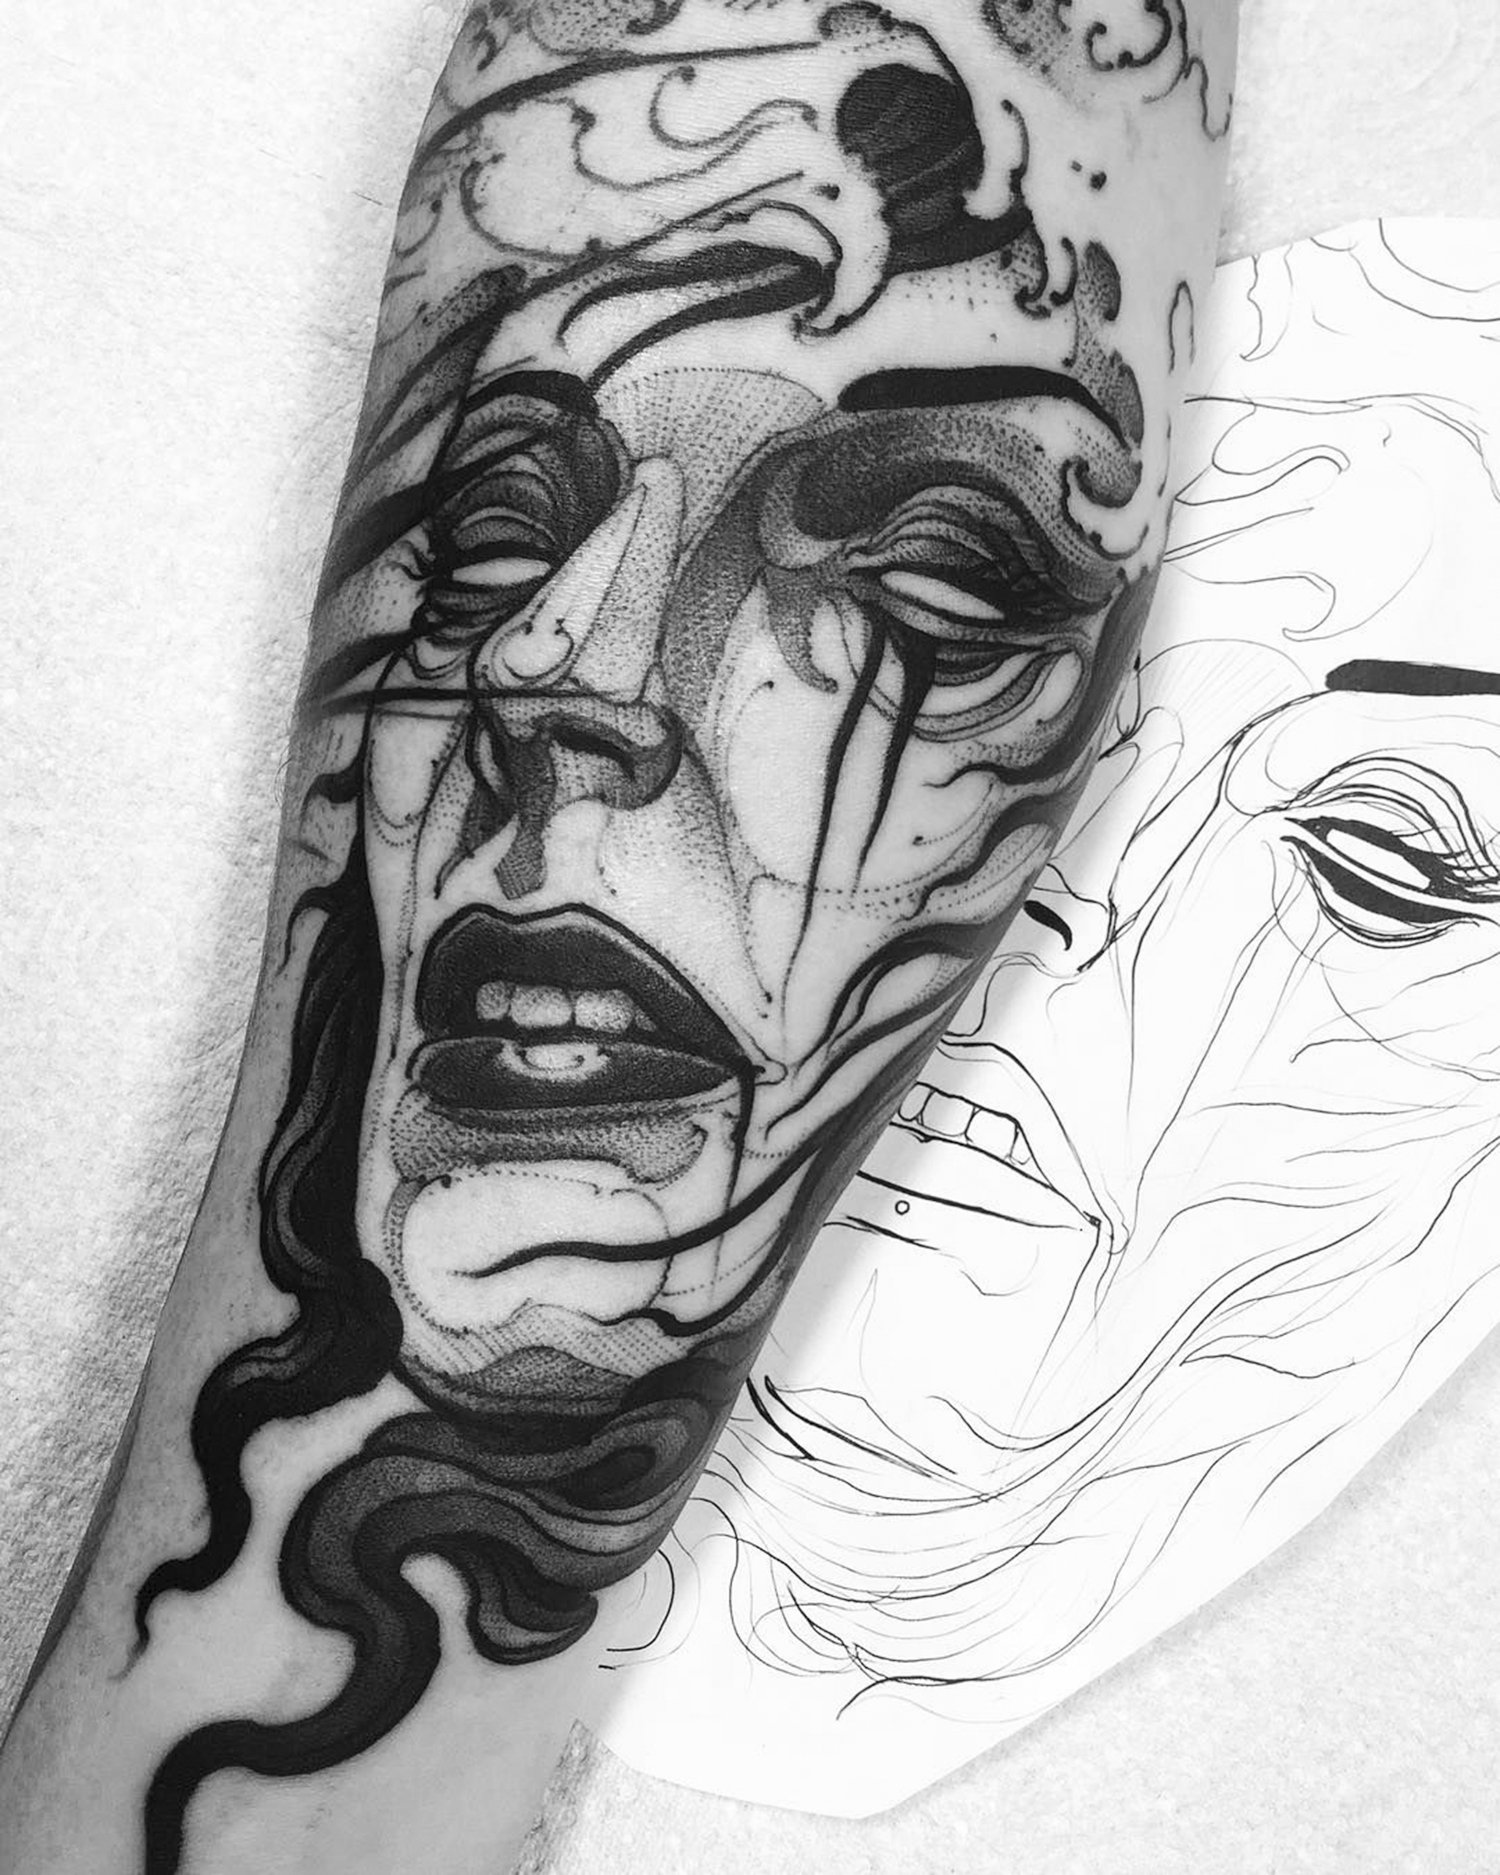 portrait of crying woman, blackwork, illustrative tattoo